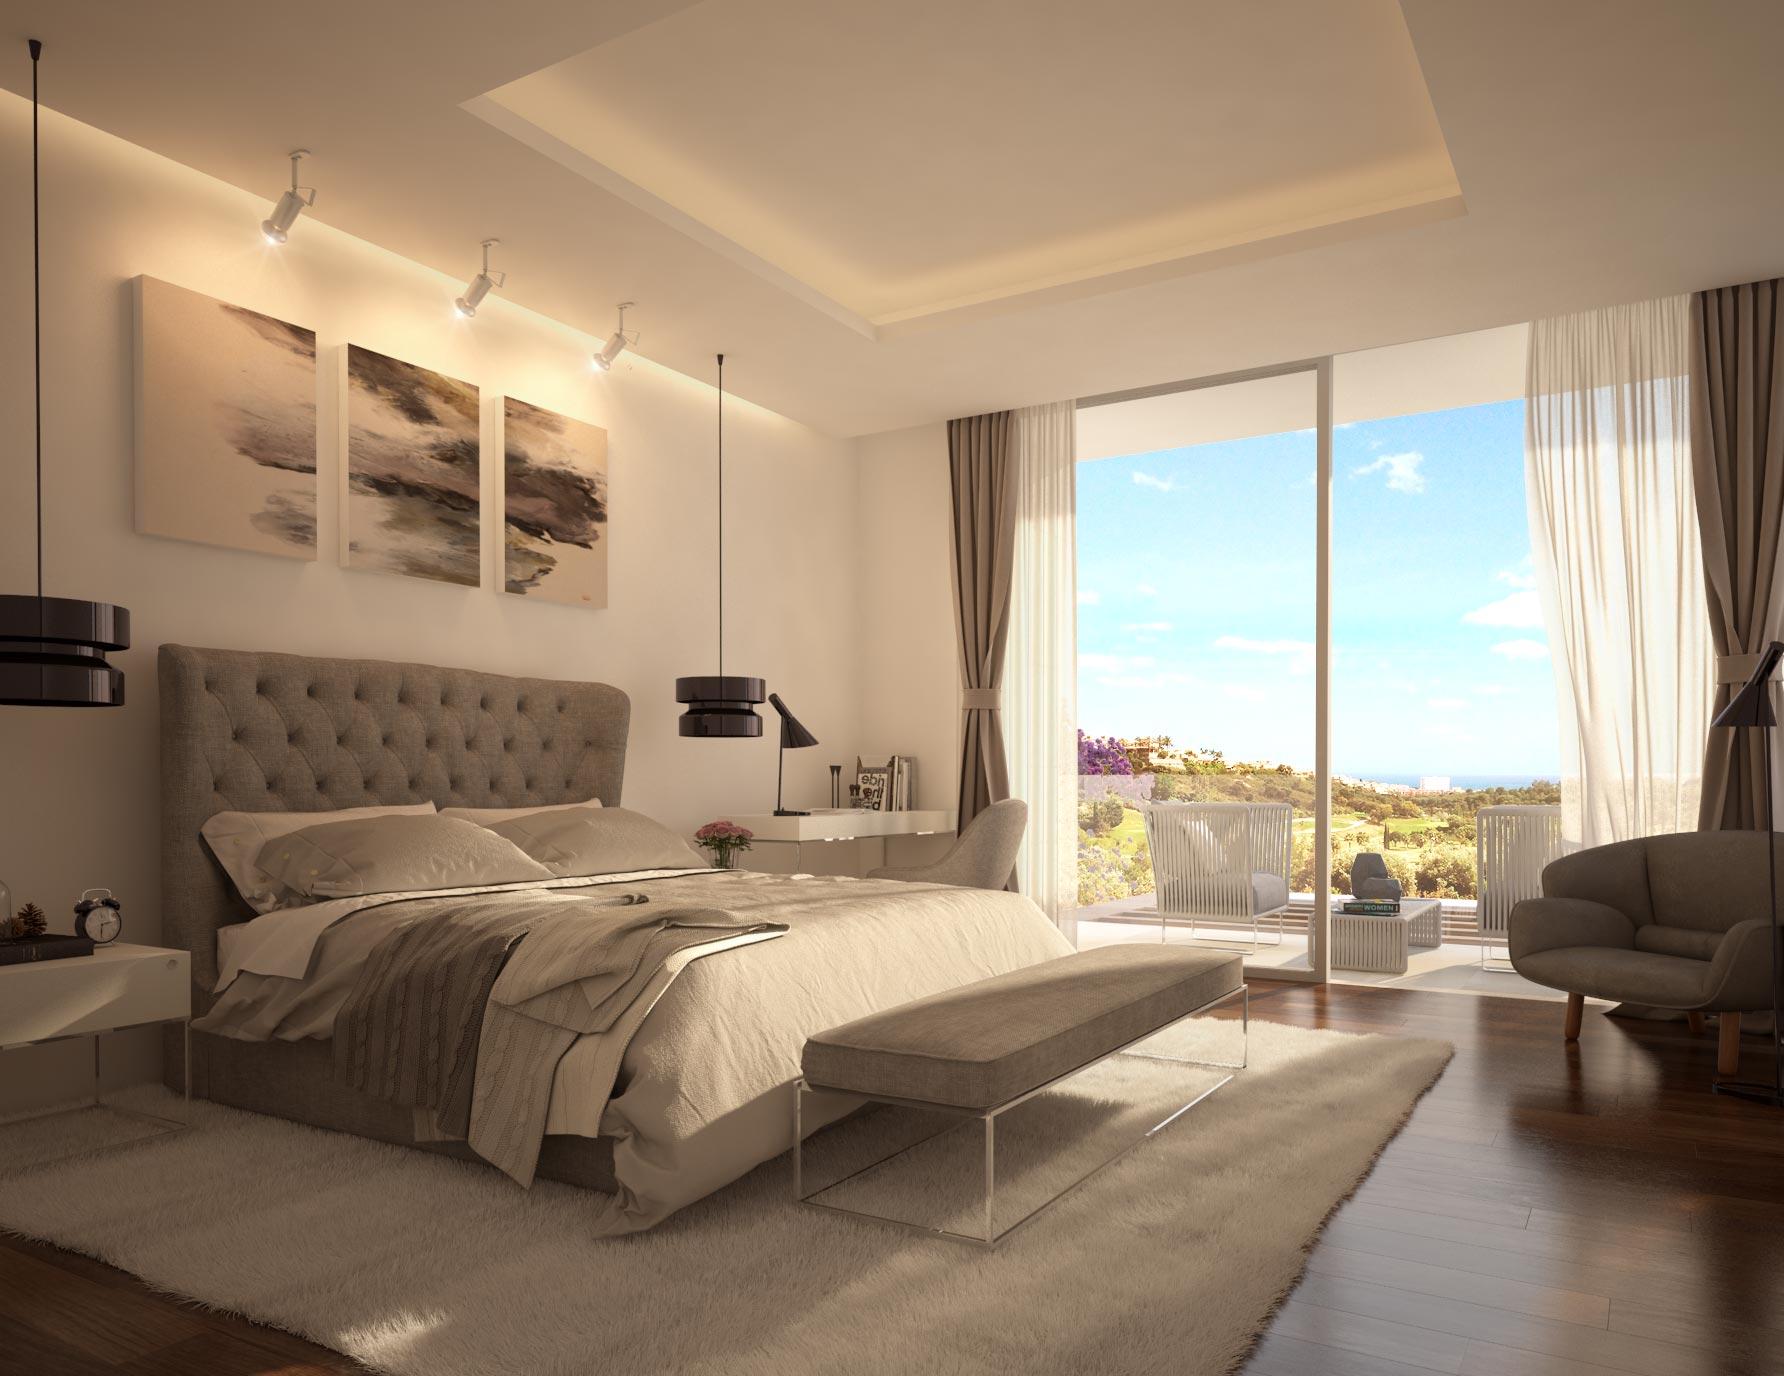 Interiorismo casas lujo Marbella